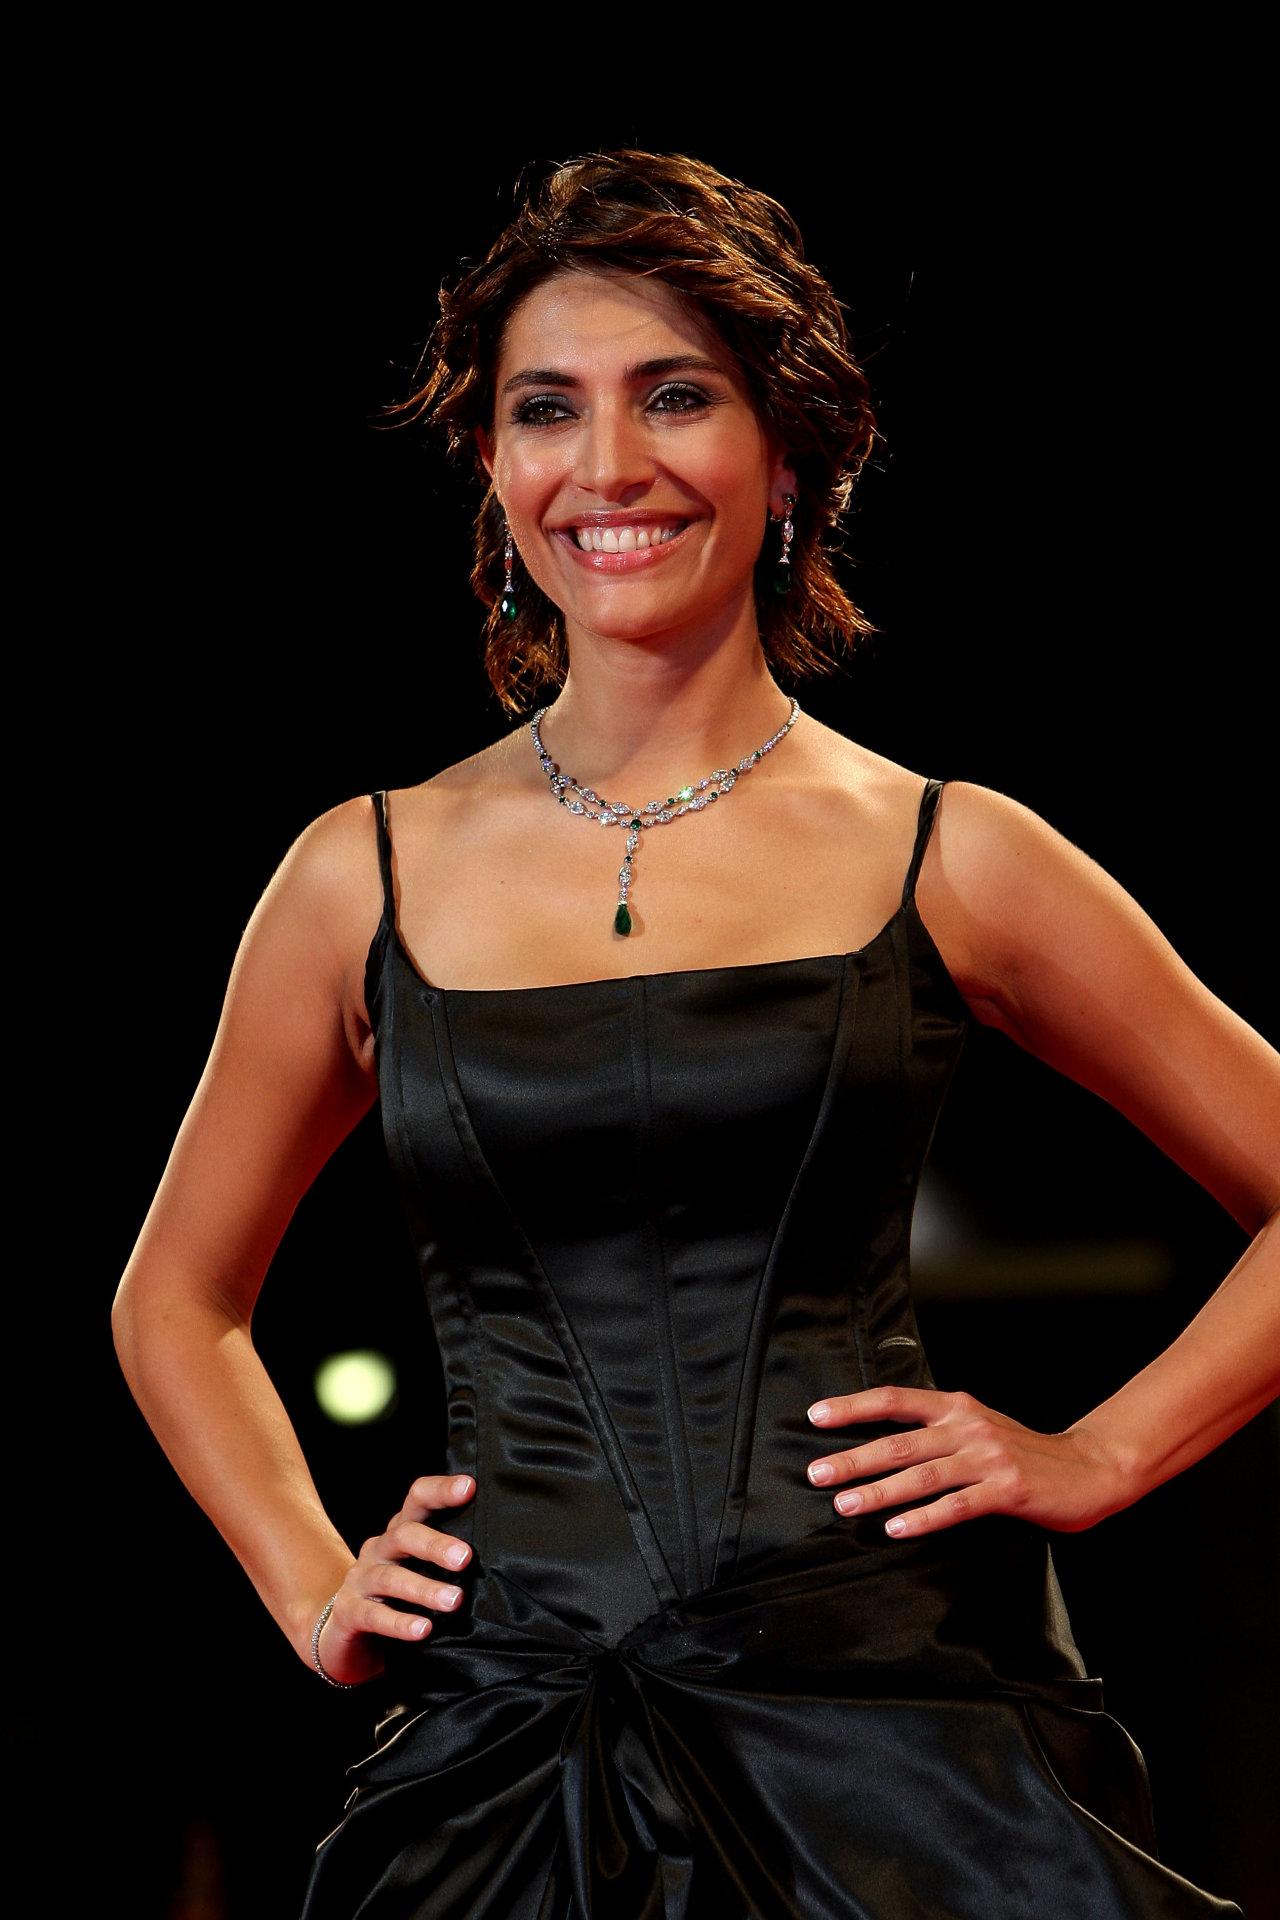 Model Caterina Murino ... Brooklyn Decker Wiki